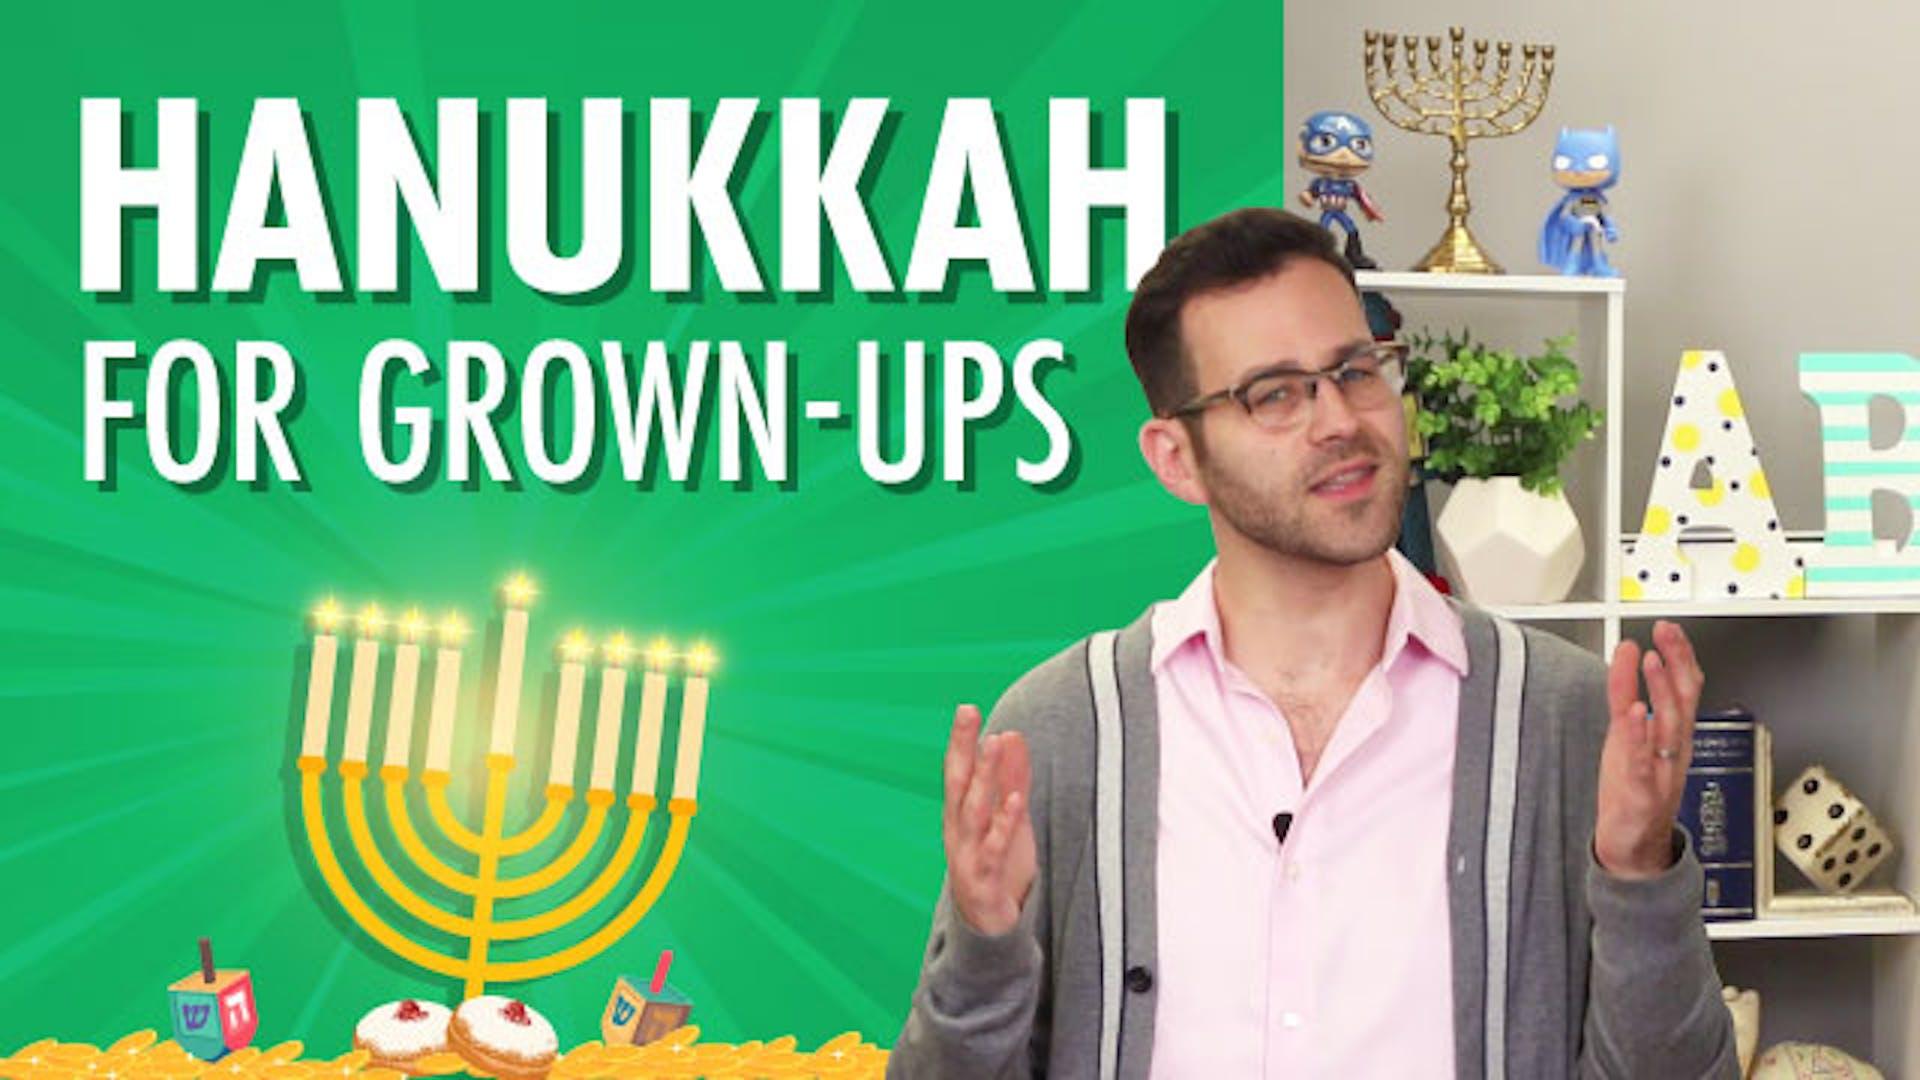 Hanukkah meaning